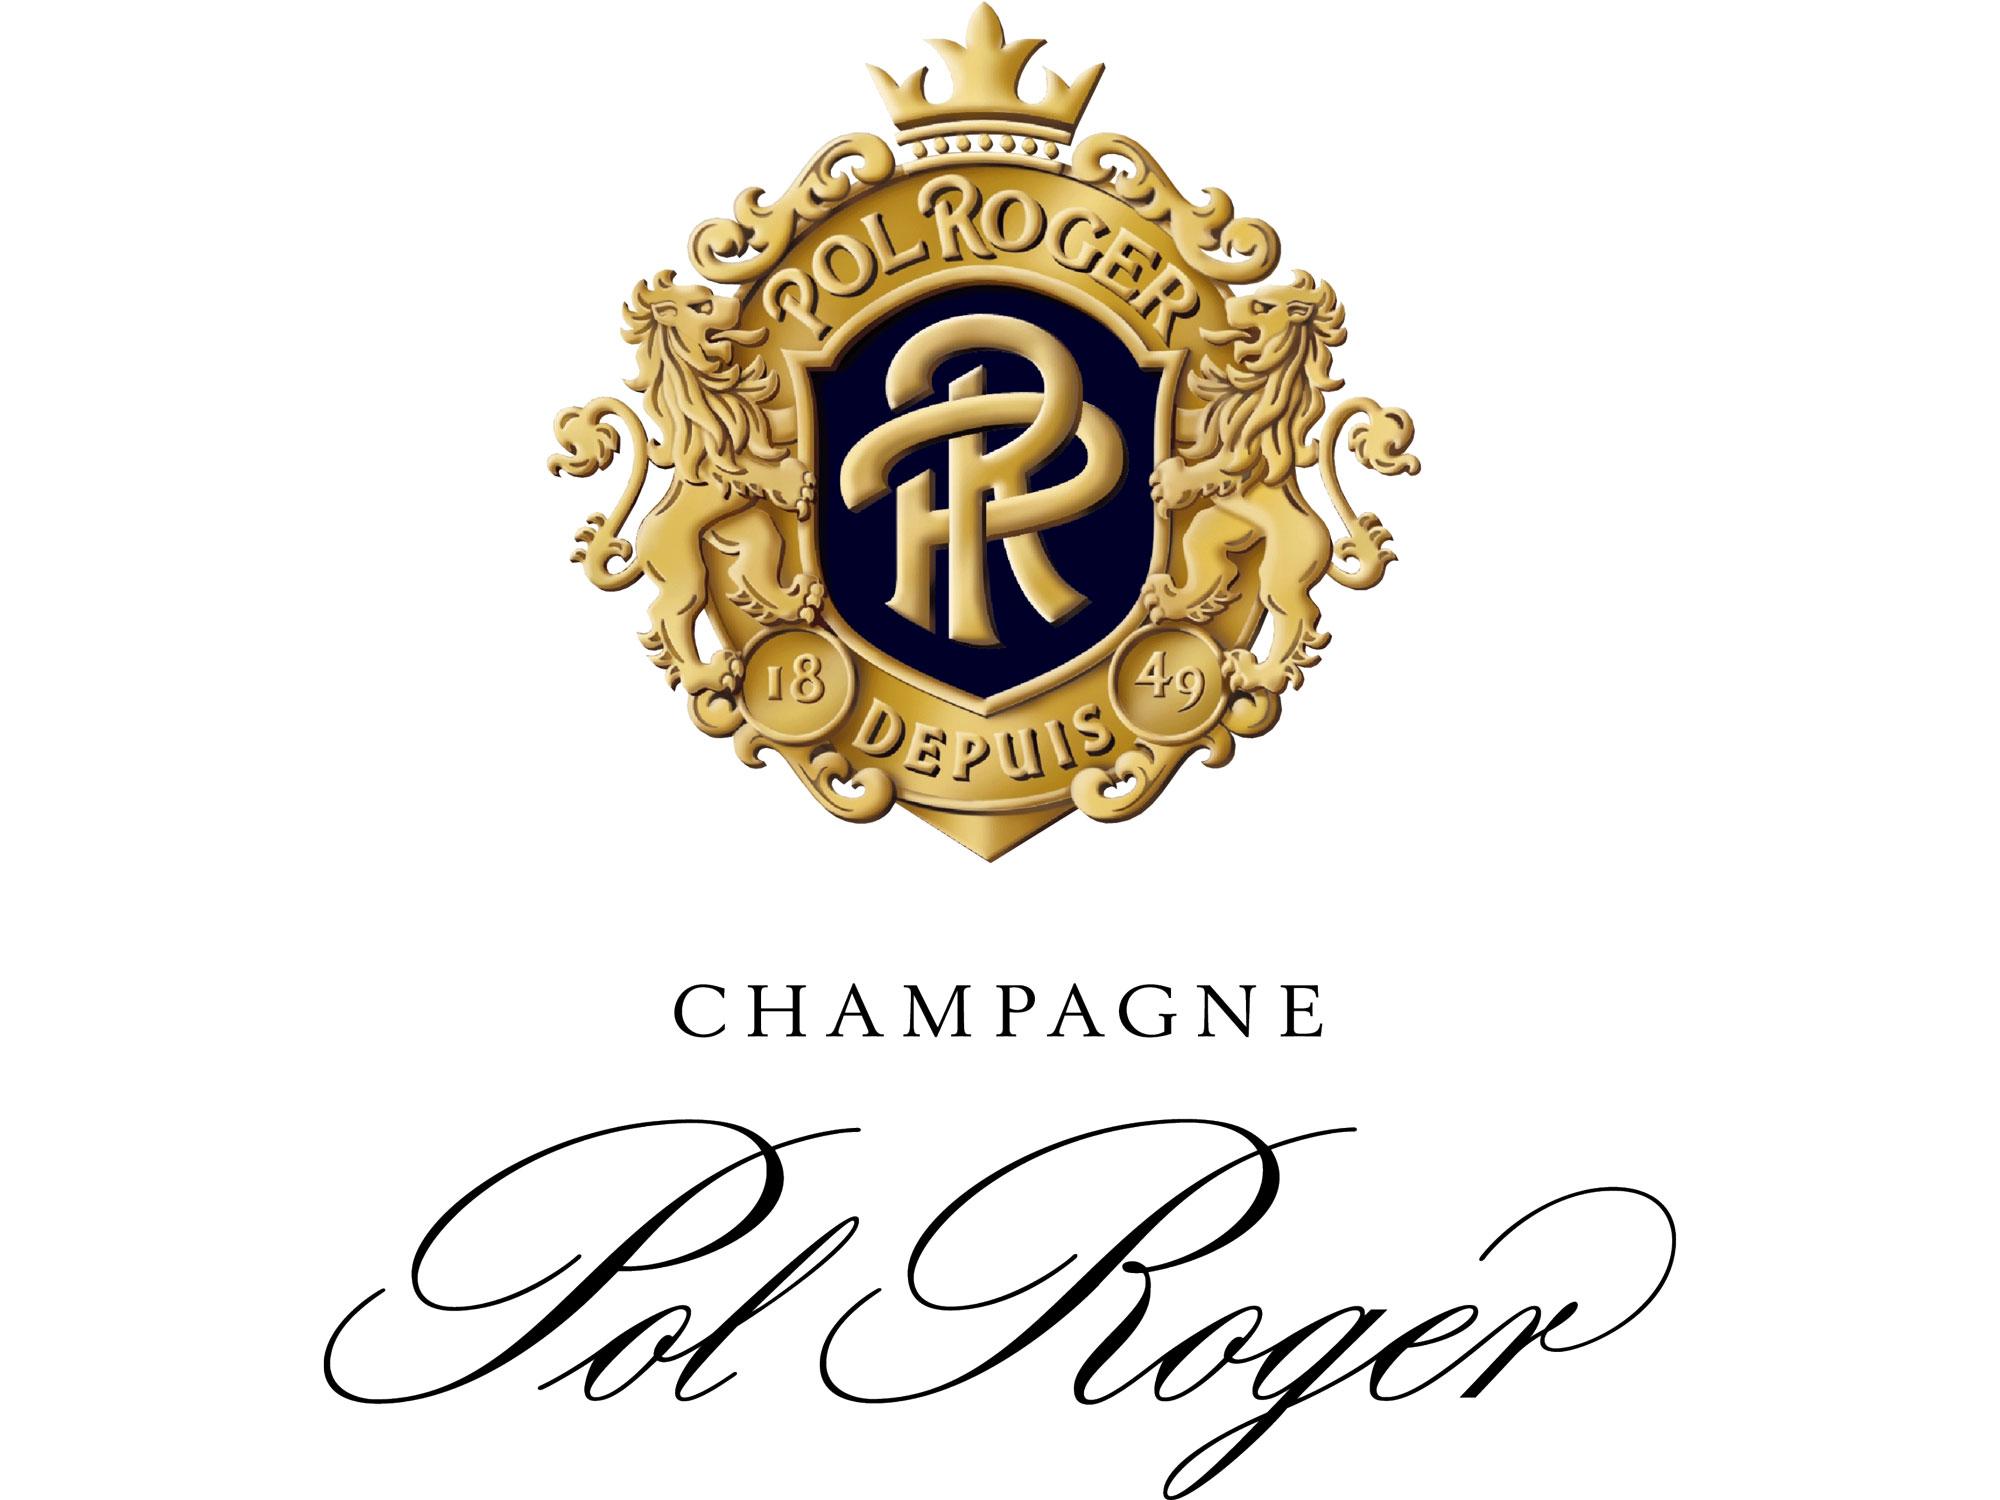 Pol-Roger Champagne